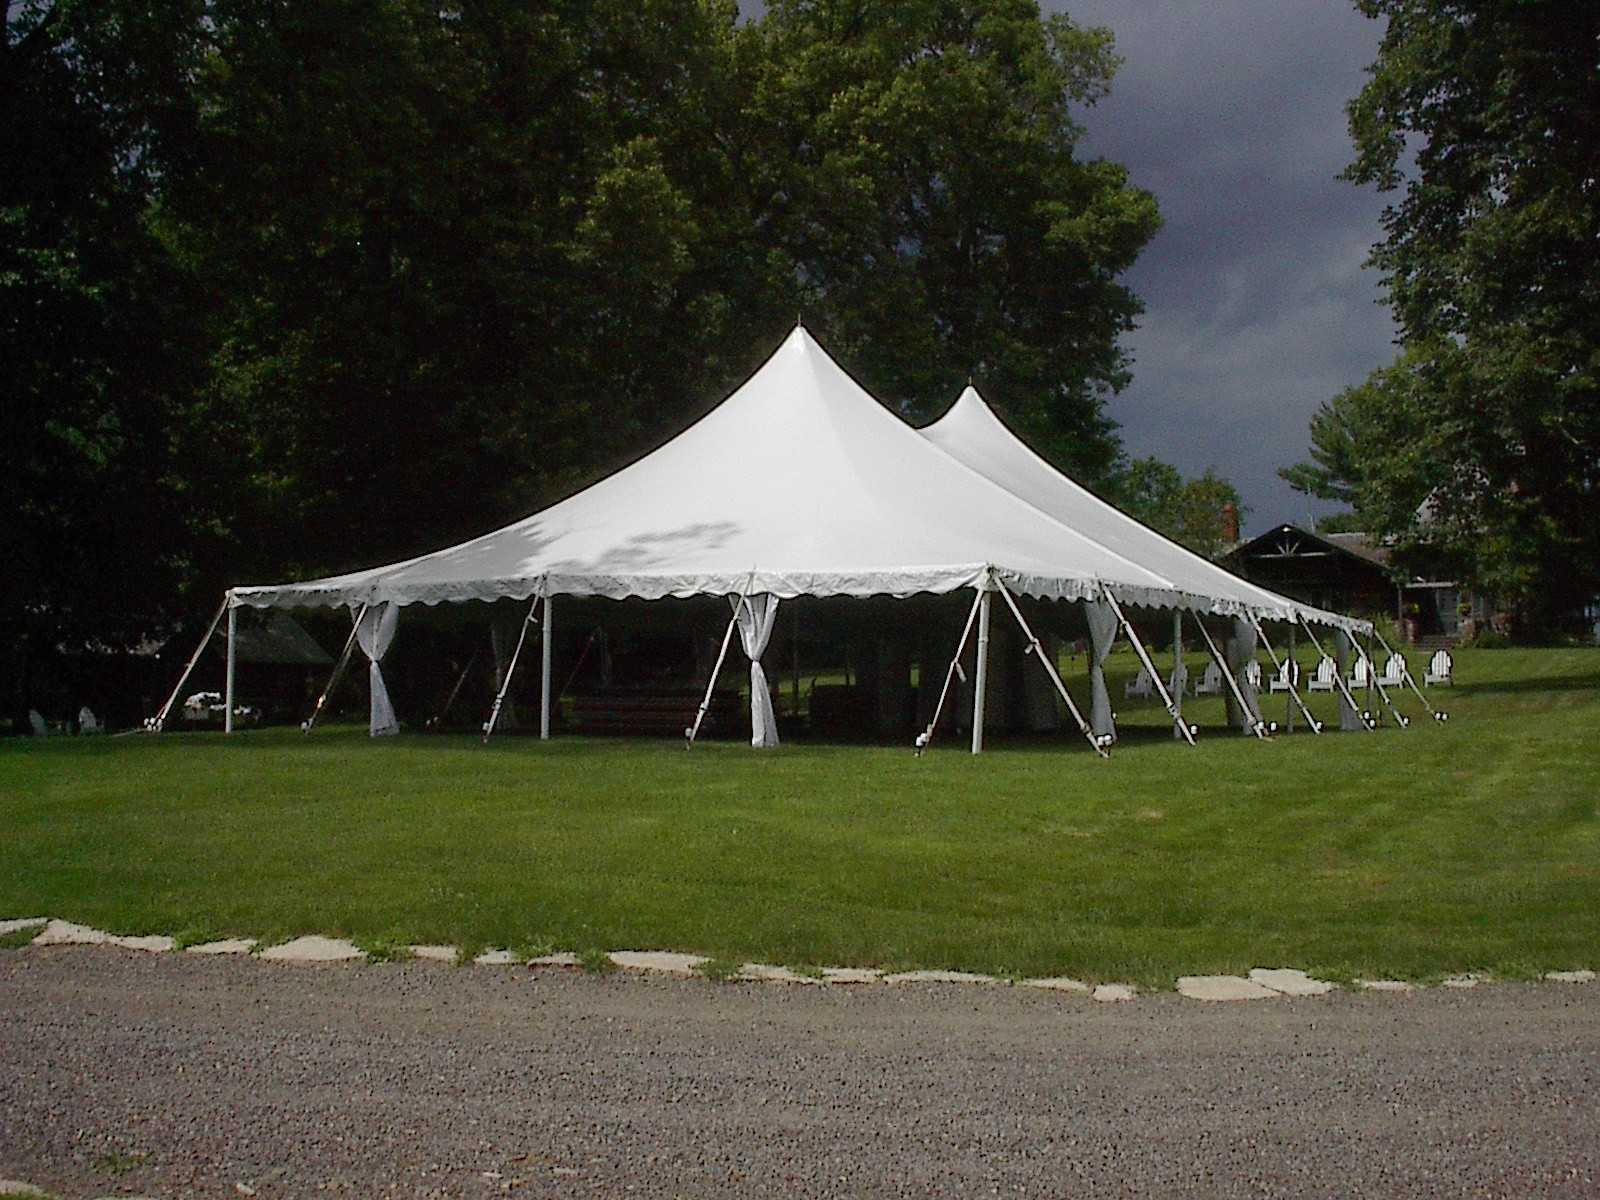 & Eau Claire A-1 Express Rental Center - 40u0027 x 80u0027 Century Pole Tent